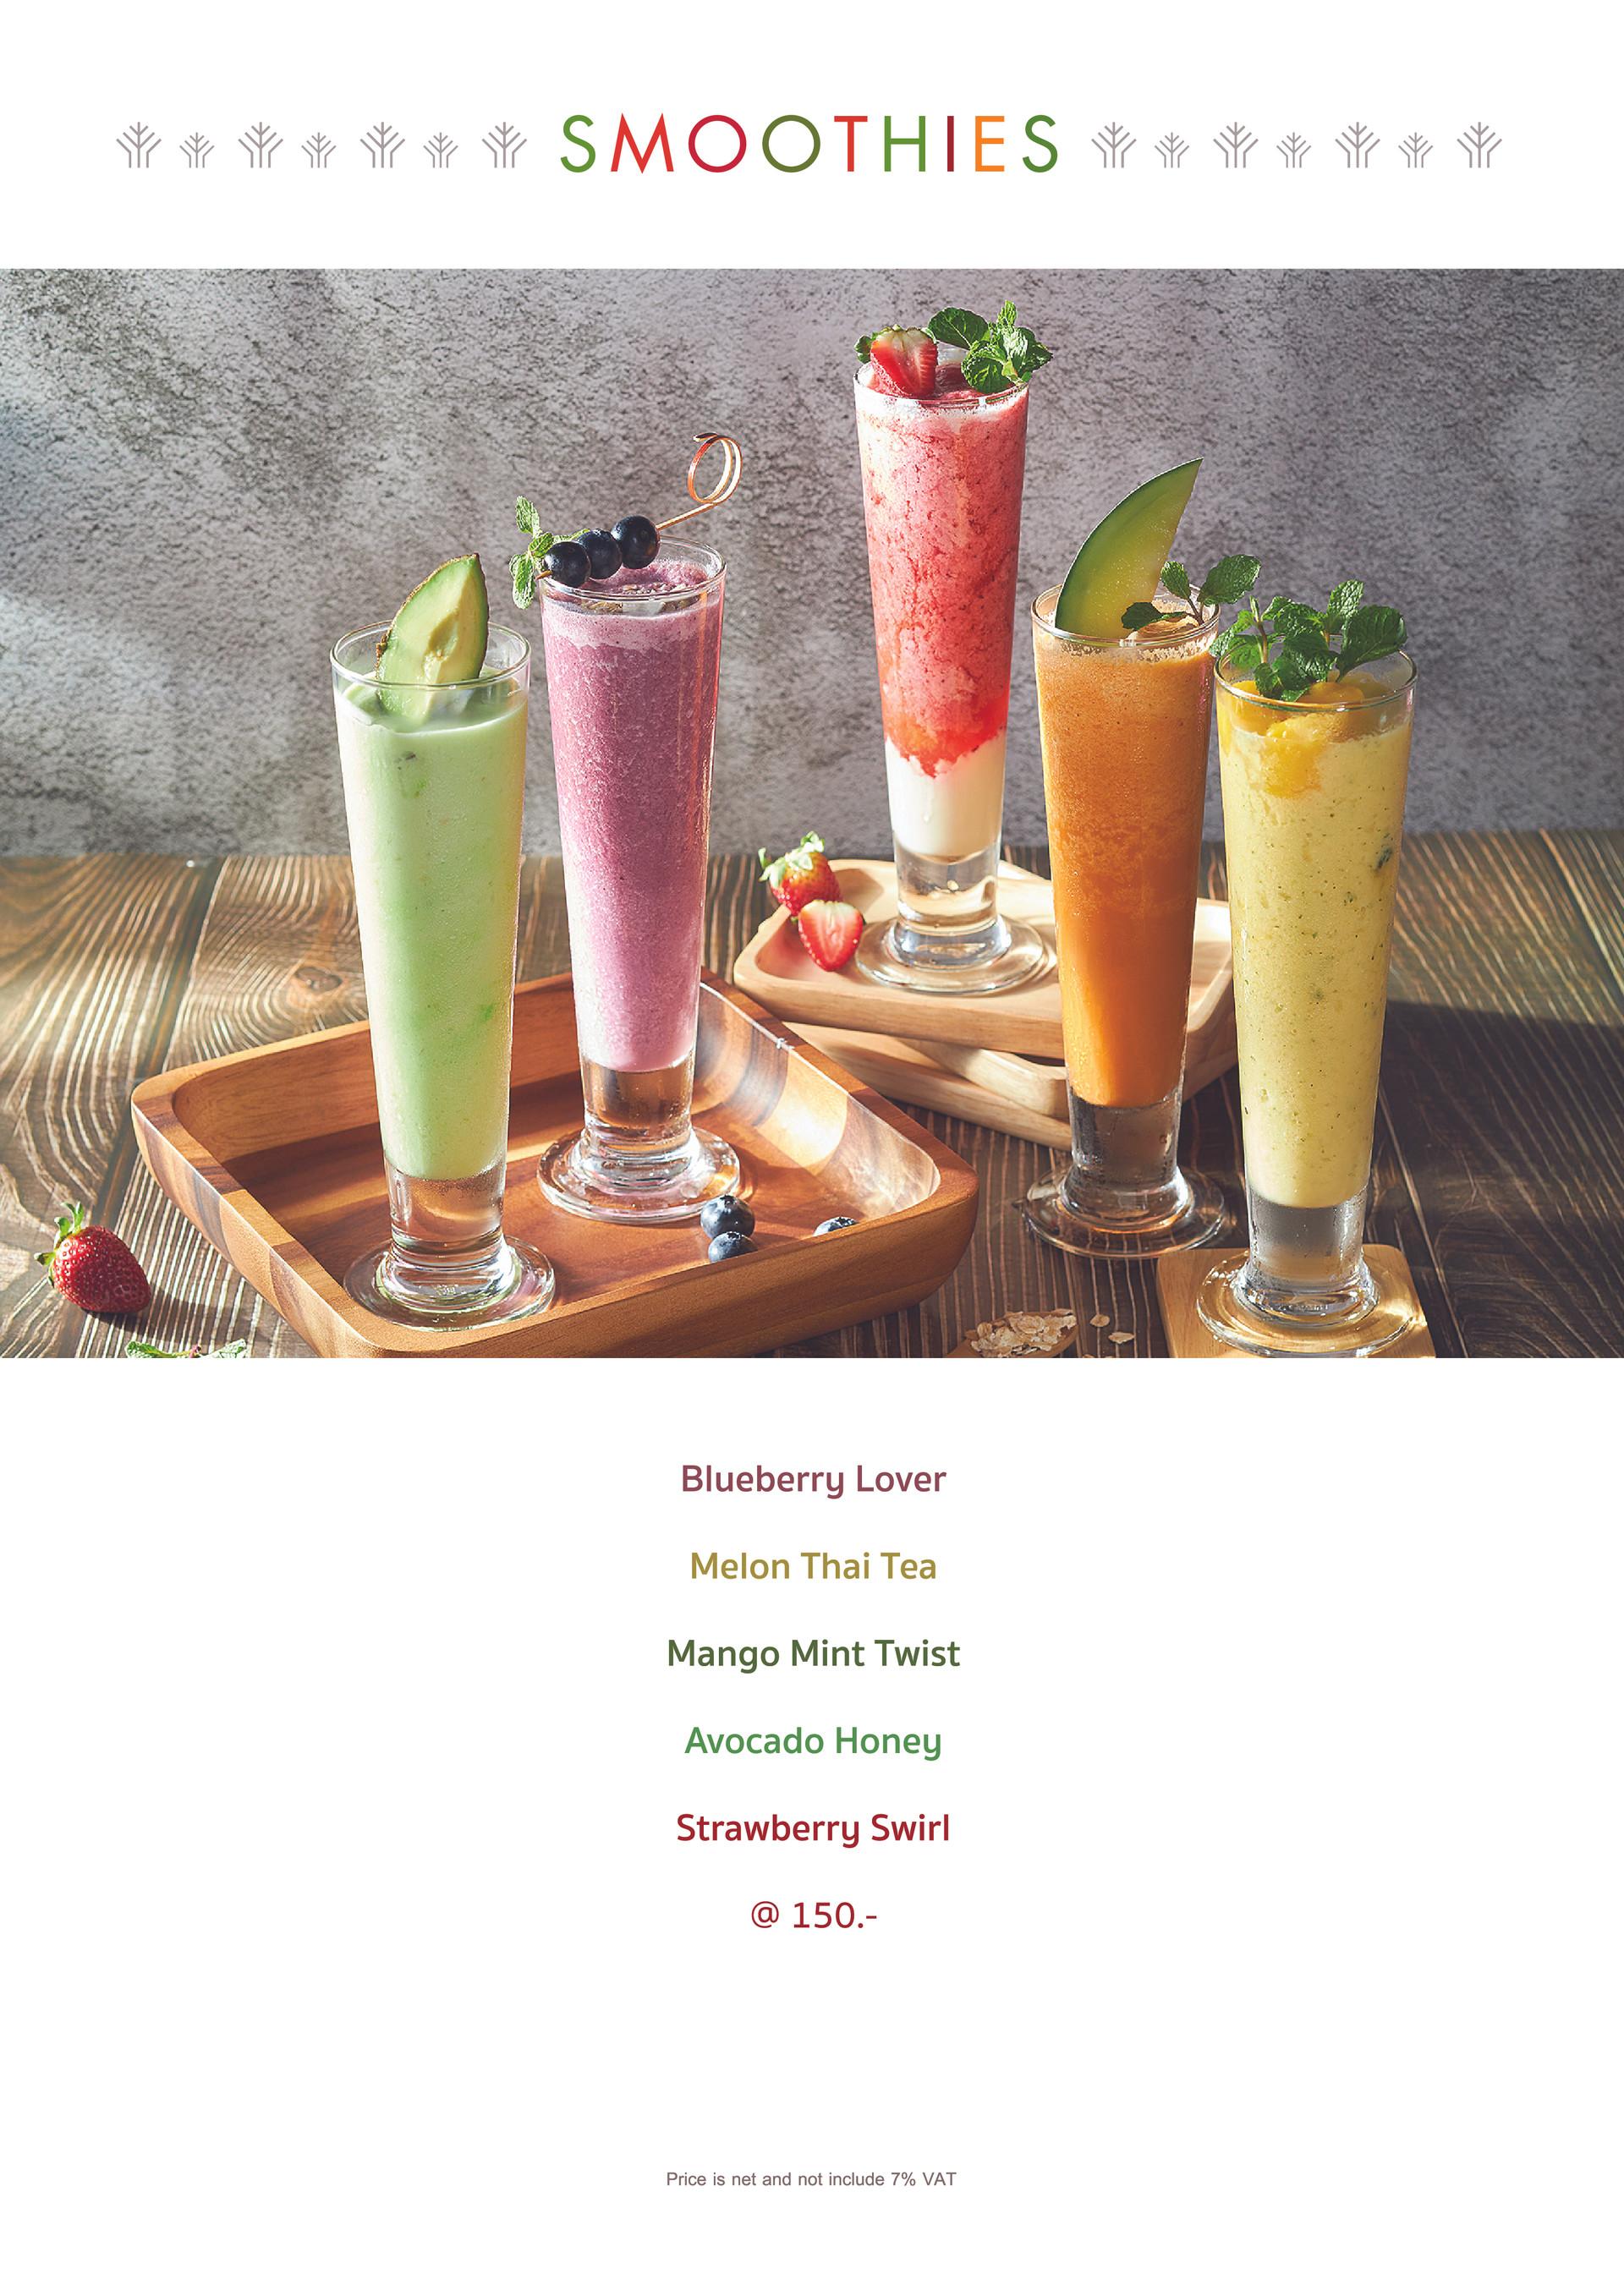 ivc new menu_15.jpg